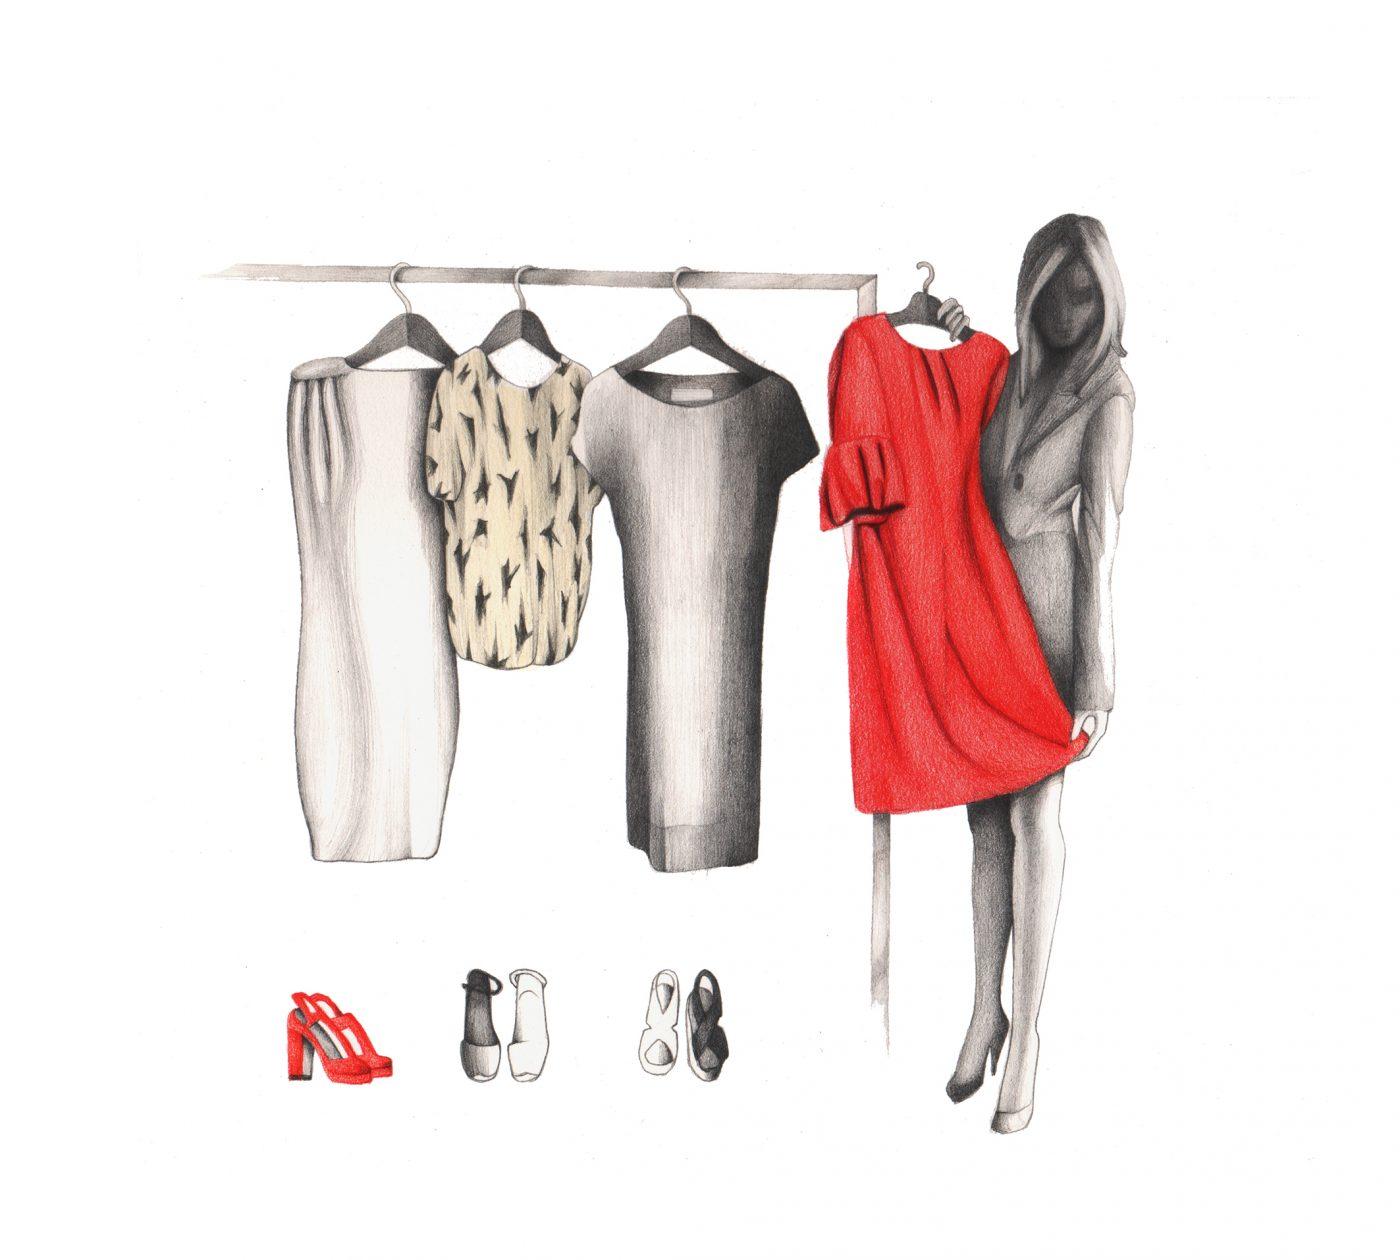 El Corte Inglés Luxury Personal Shopping